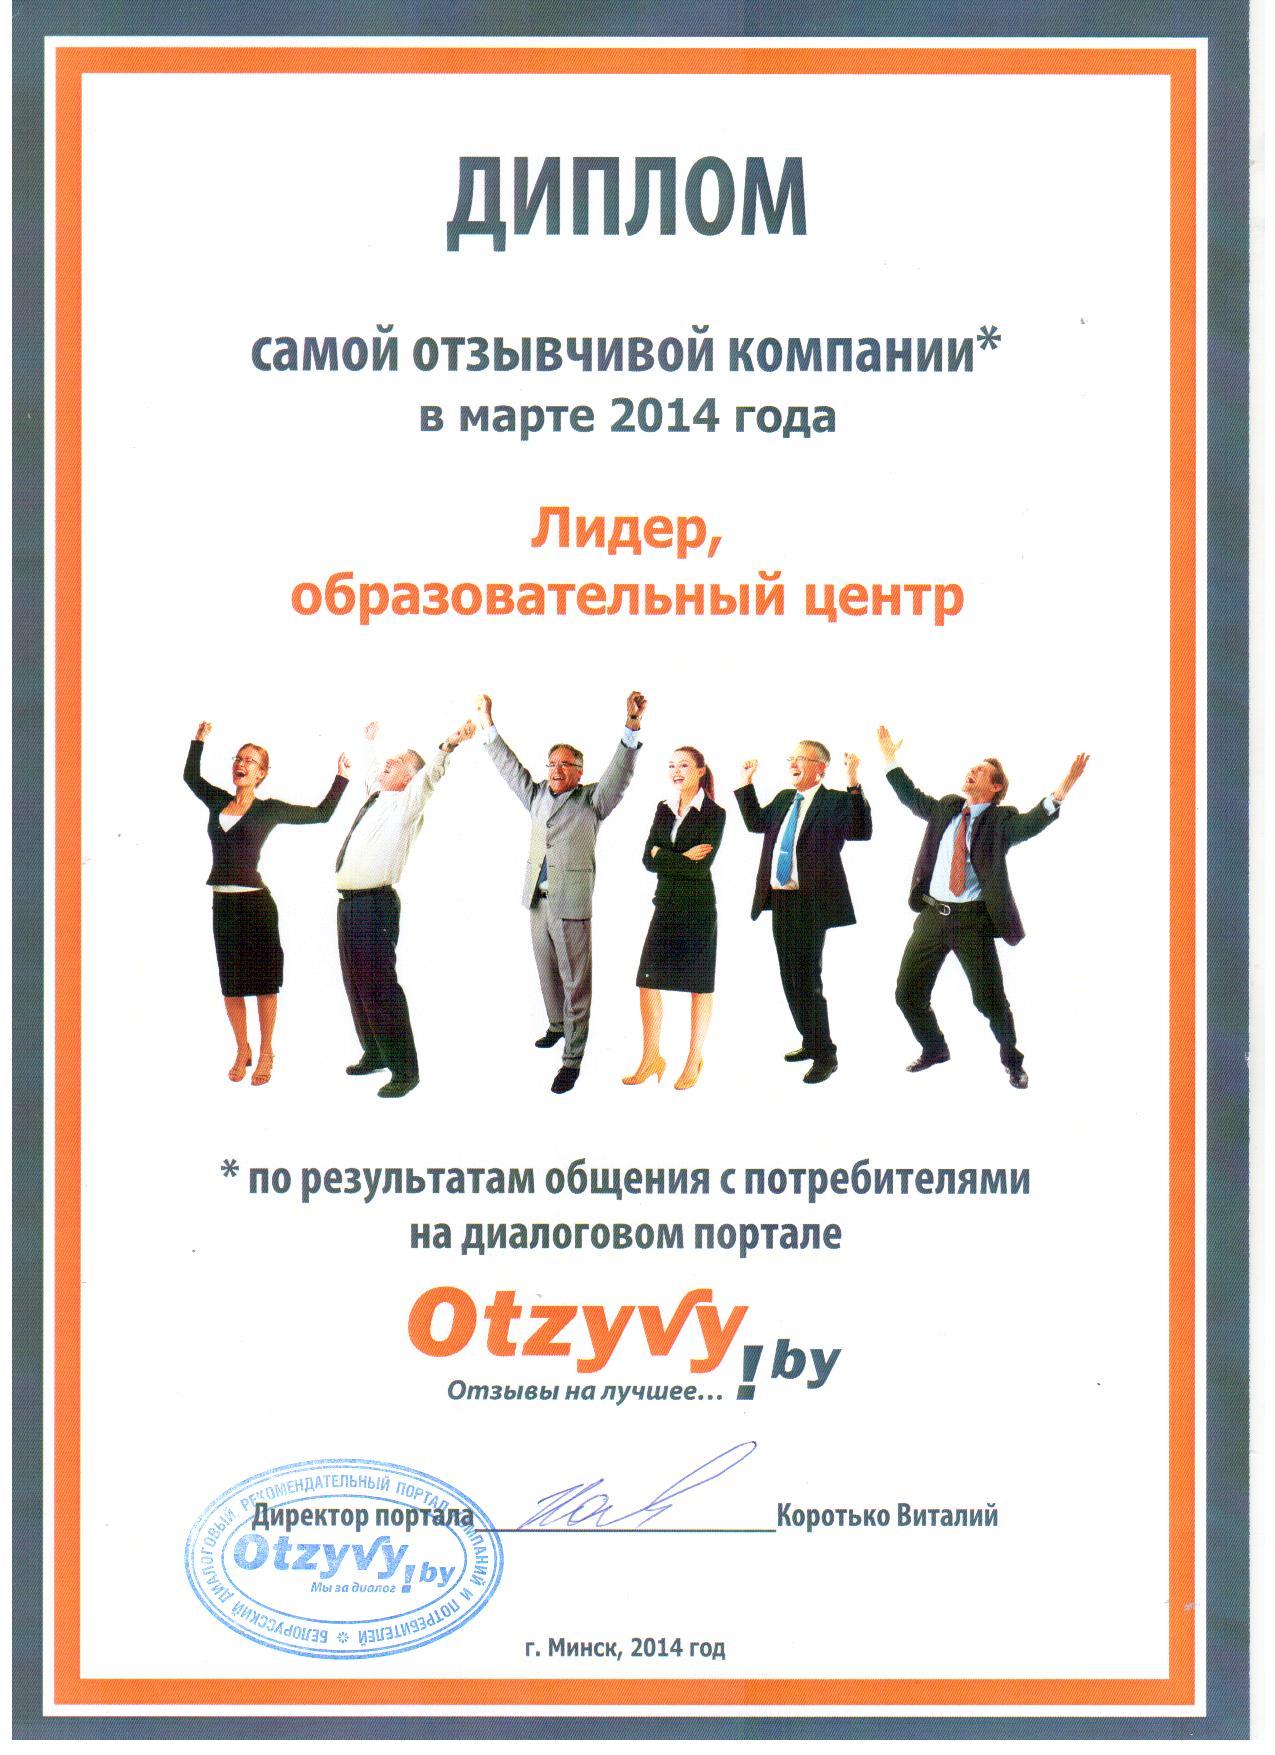 otzyvy.by март2014